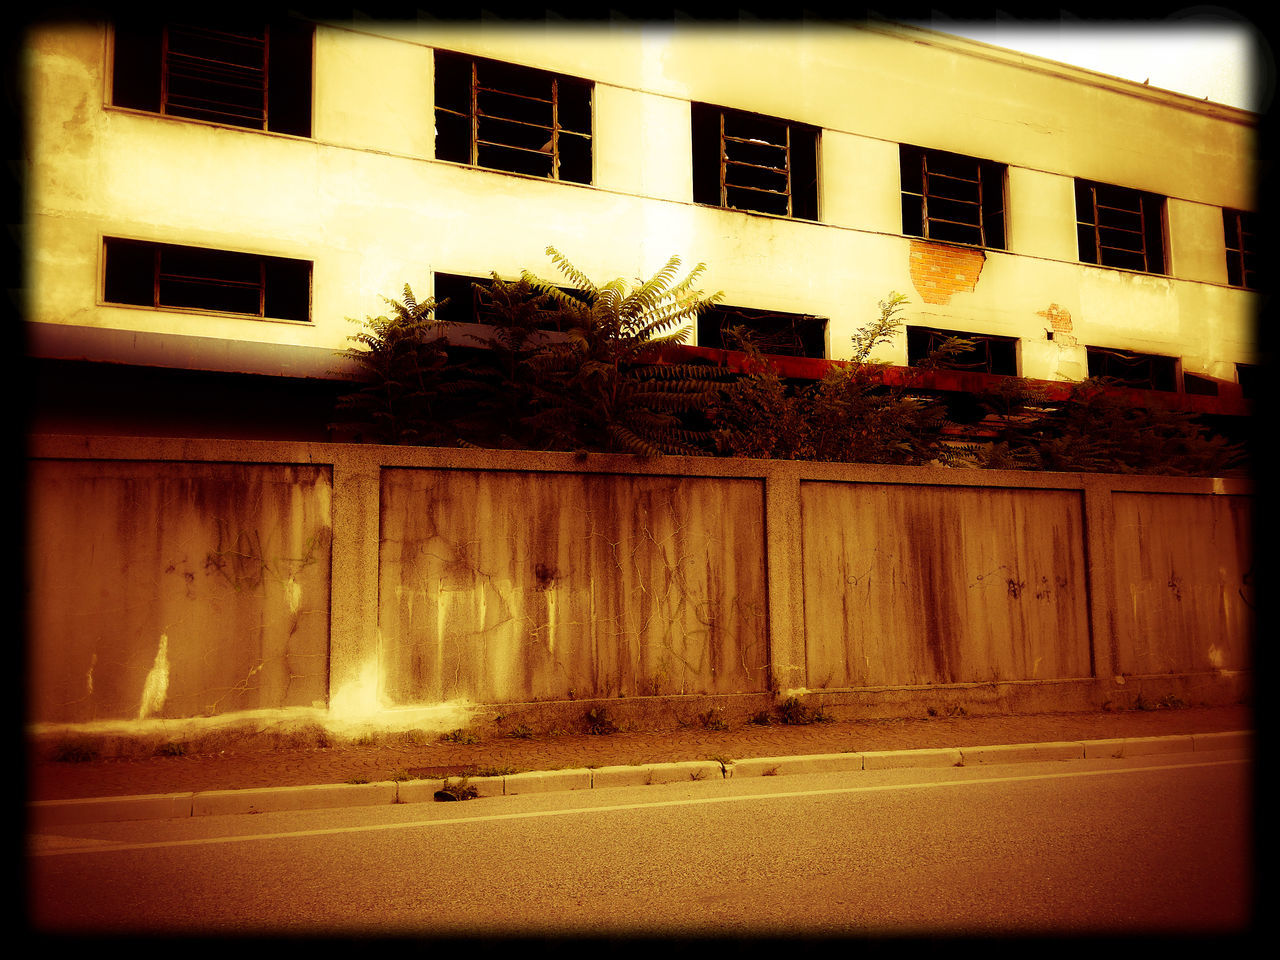 Empty Road Beside Building